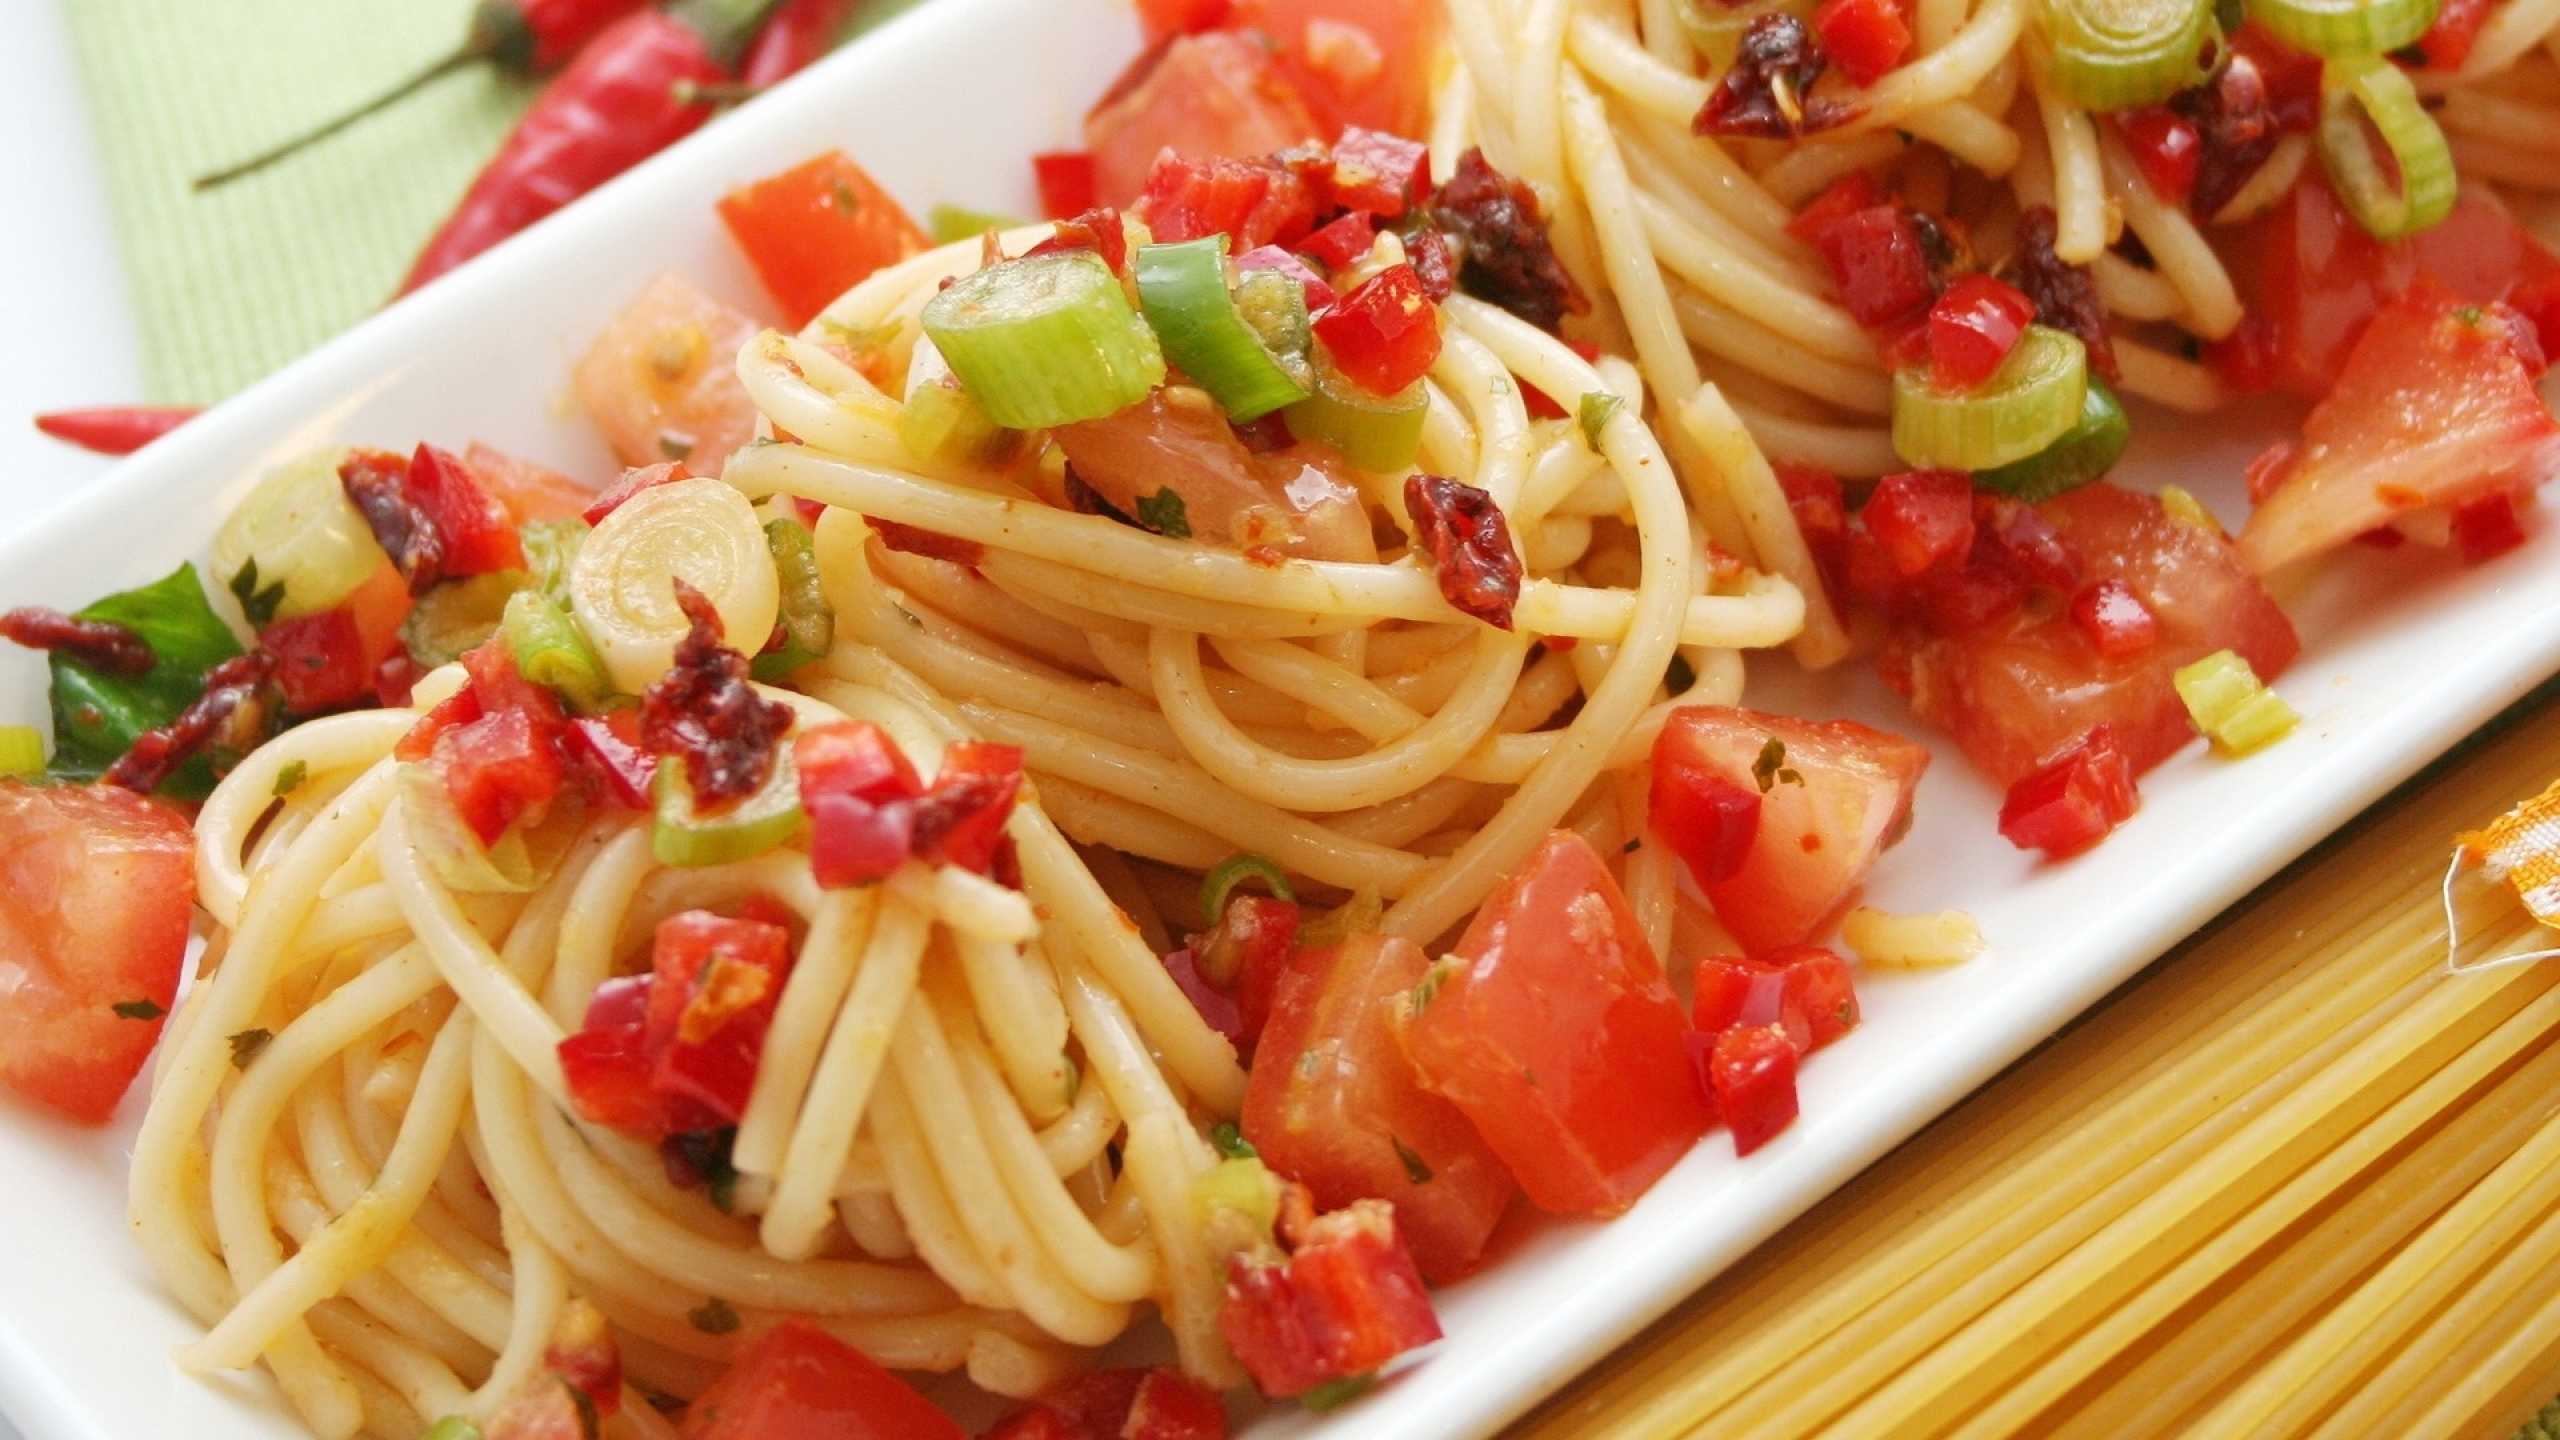 Spaghetti Spicy Photography Food Wallpaper HD Desktop Free #988834885 Wallpaper